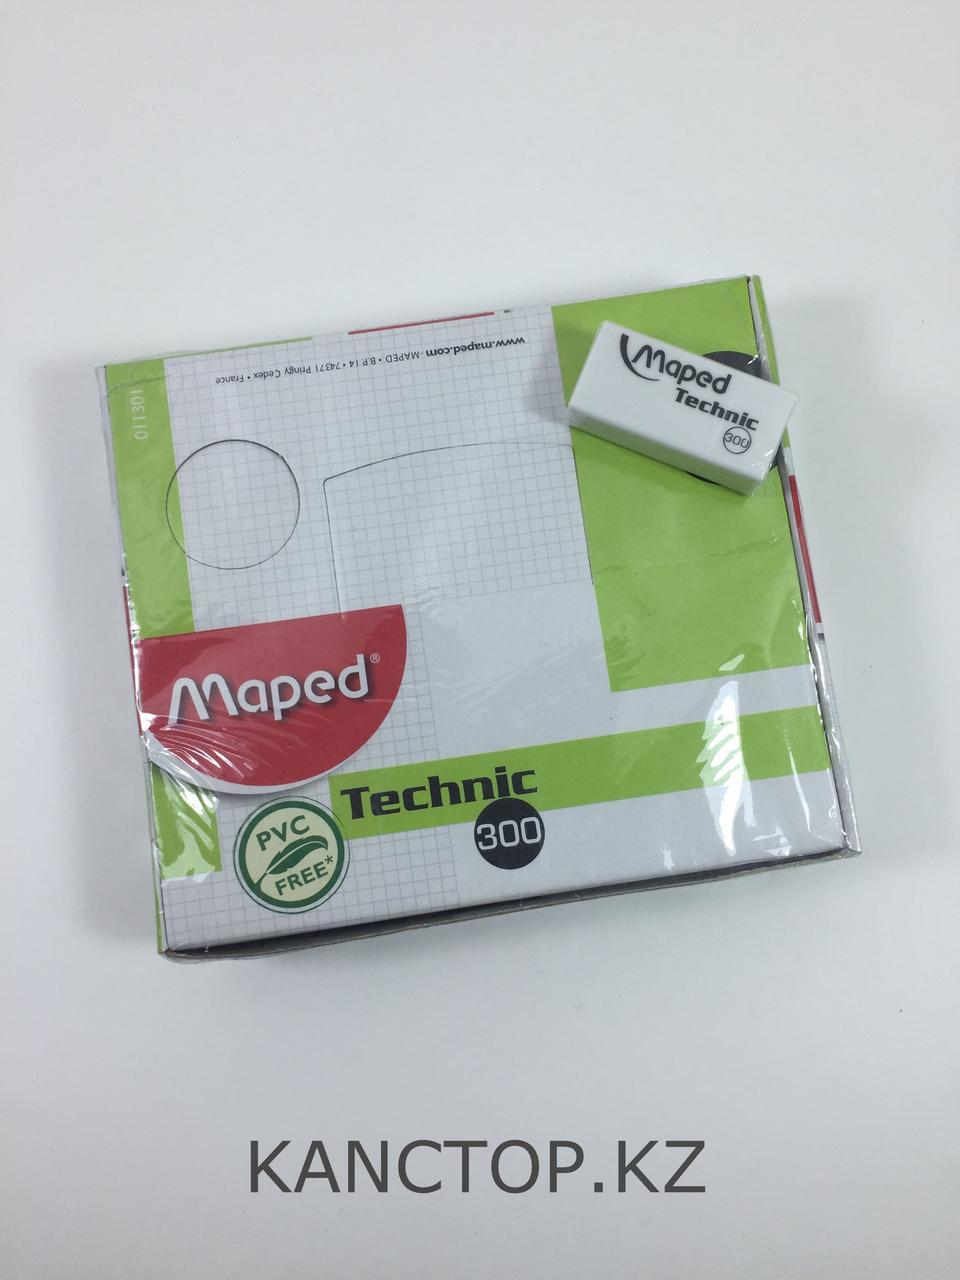 Ластик резинка Maped Technic белая